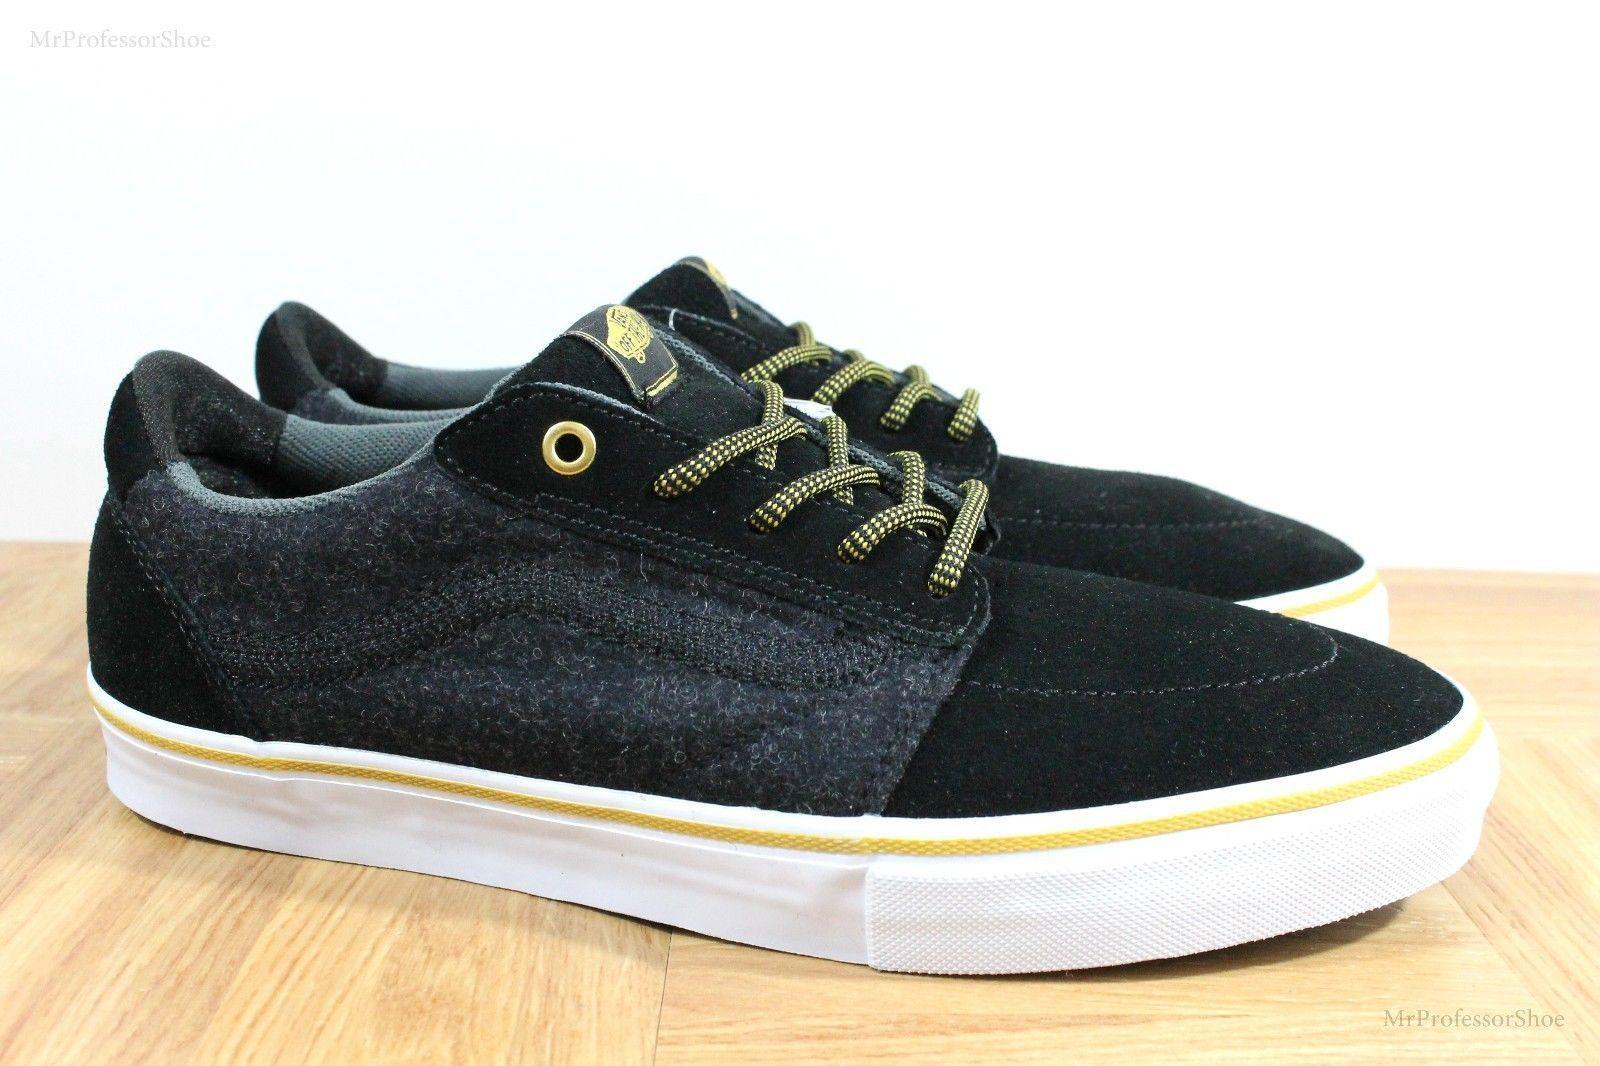 Vans Lindero (Wool) Black/Gold Skate Shoes MEN'S 7.5 WOMEN'S 9